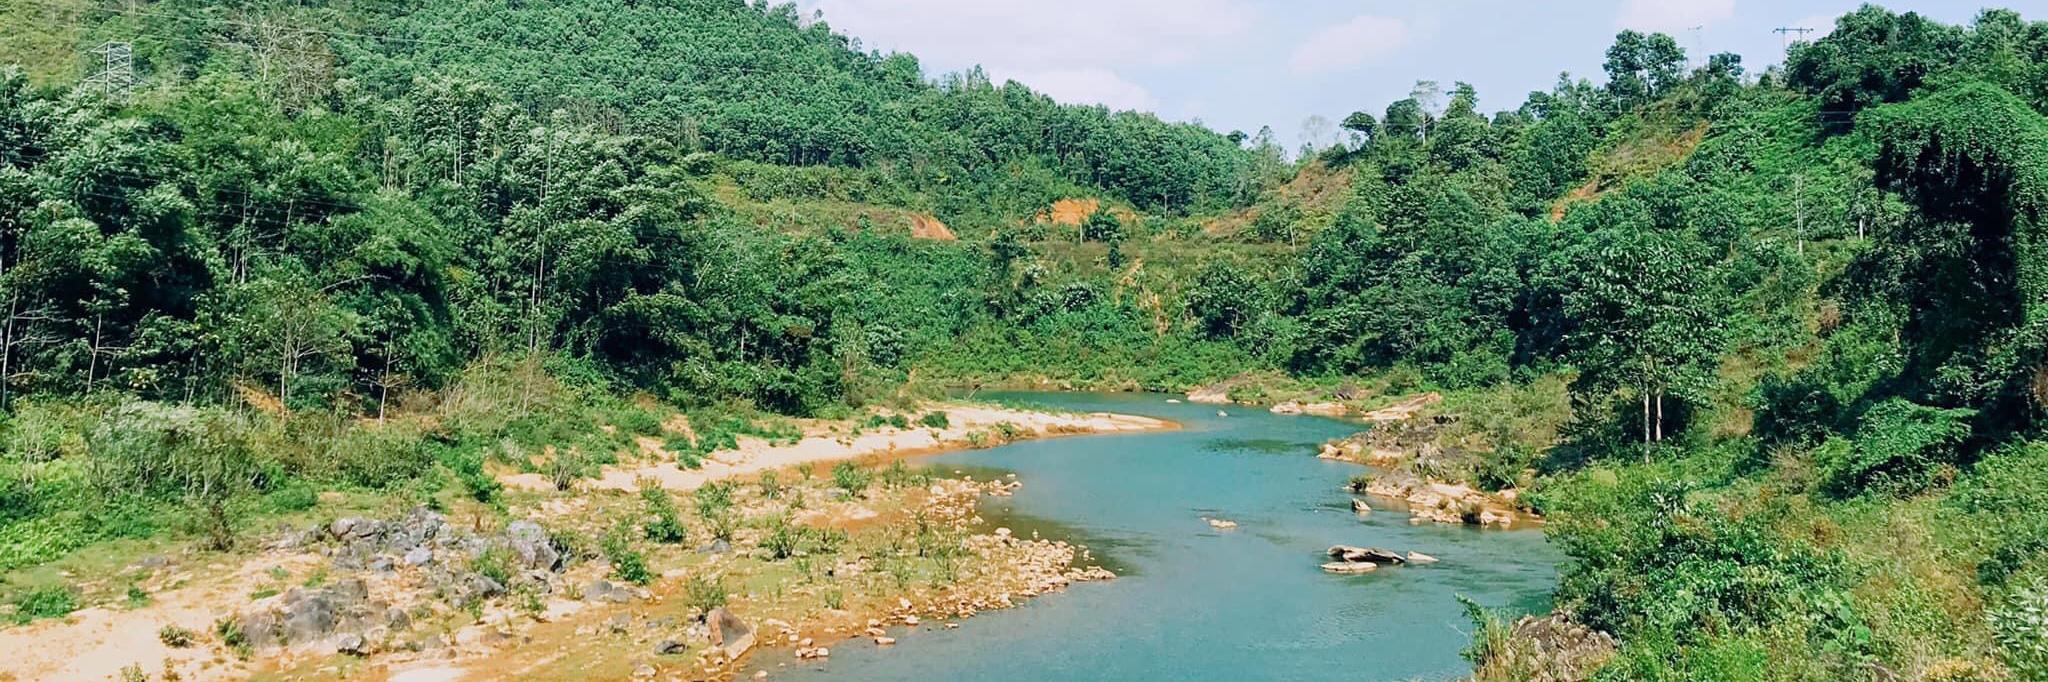 https://gody.vn/blog/congchua_mauhong803174/post/kham-pha-thien-duong-co-that-o-dinh-que-tay-giang-9038